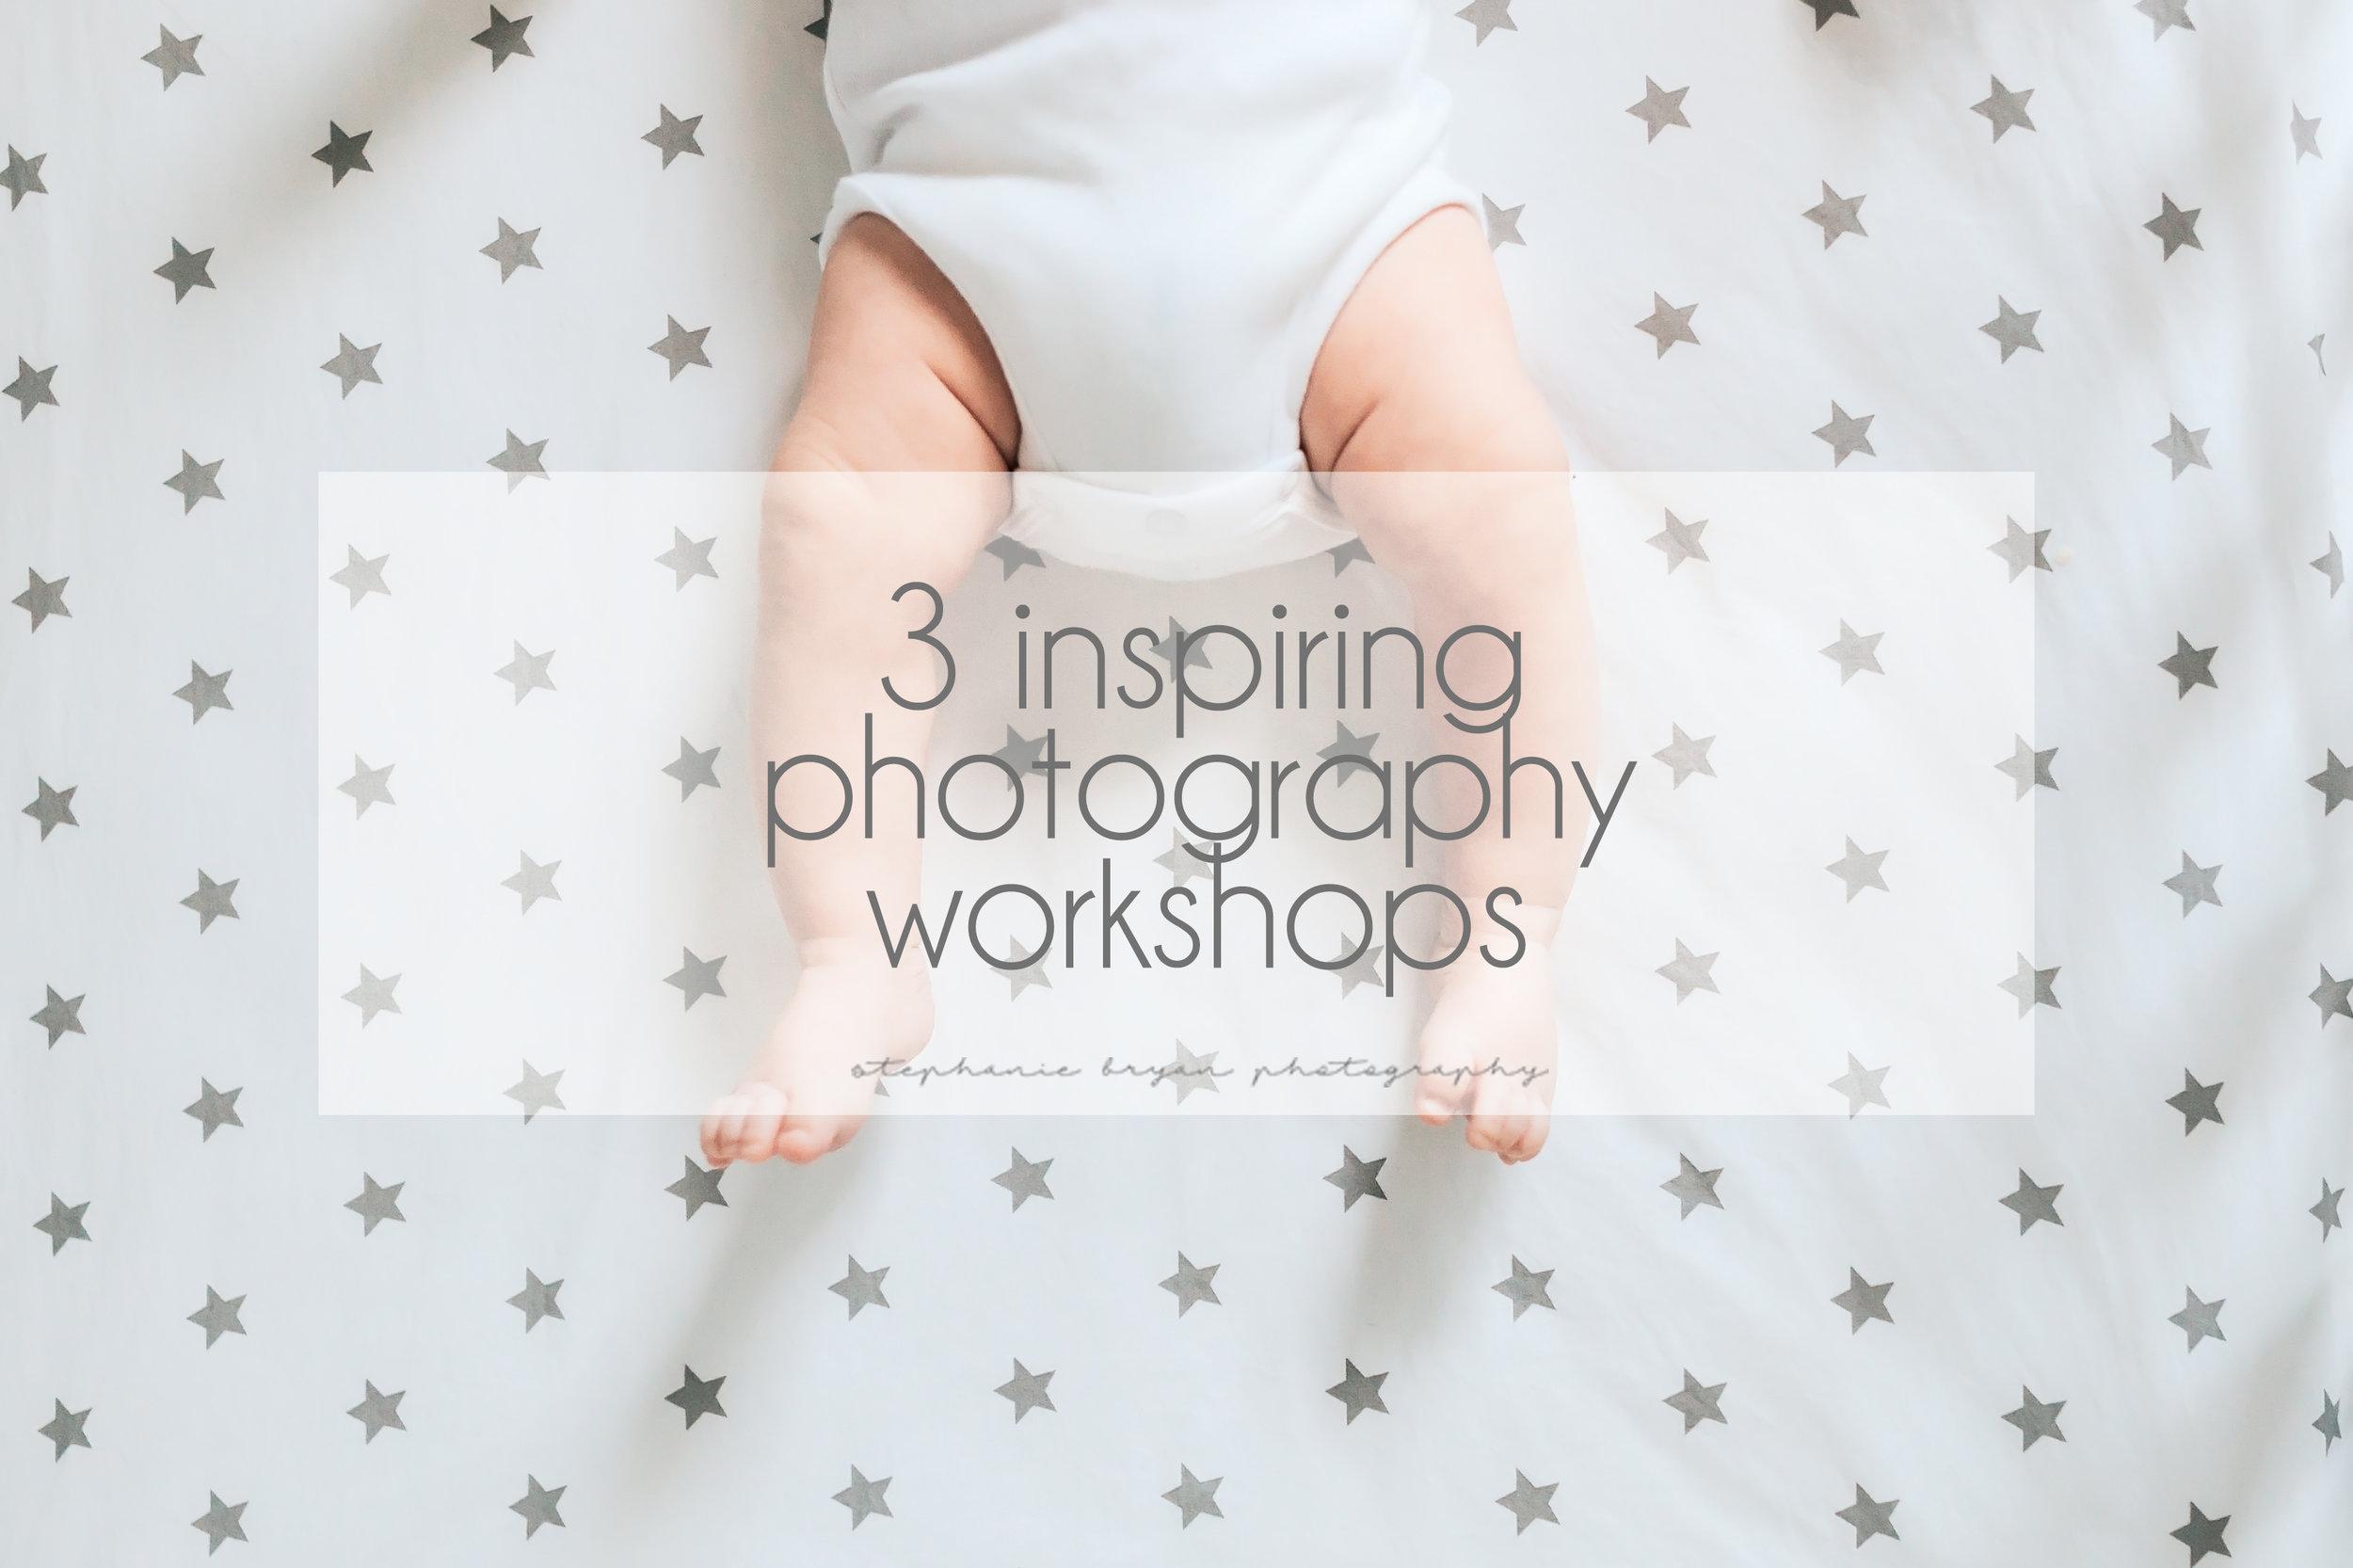 Stephanie Bryan Photography - 3 inspiring photography workshops